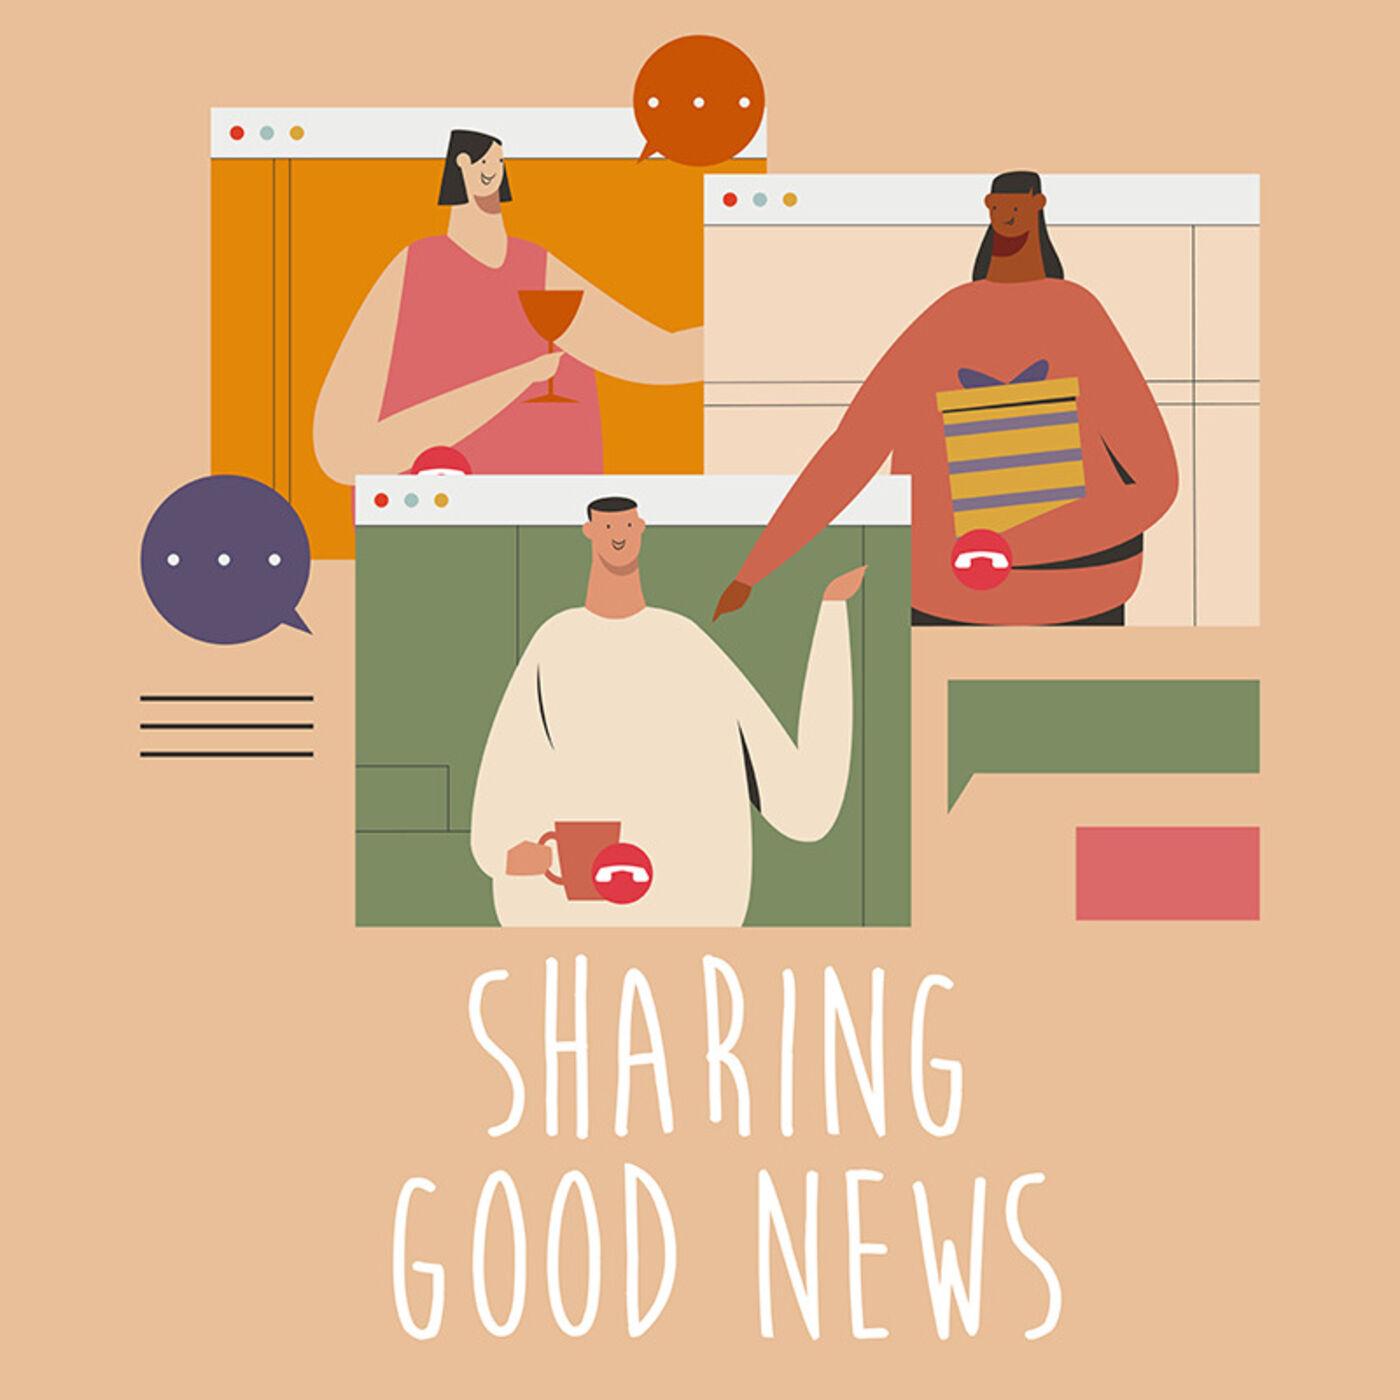 12@12: Sharing Good News